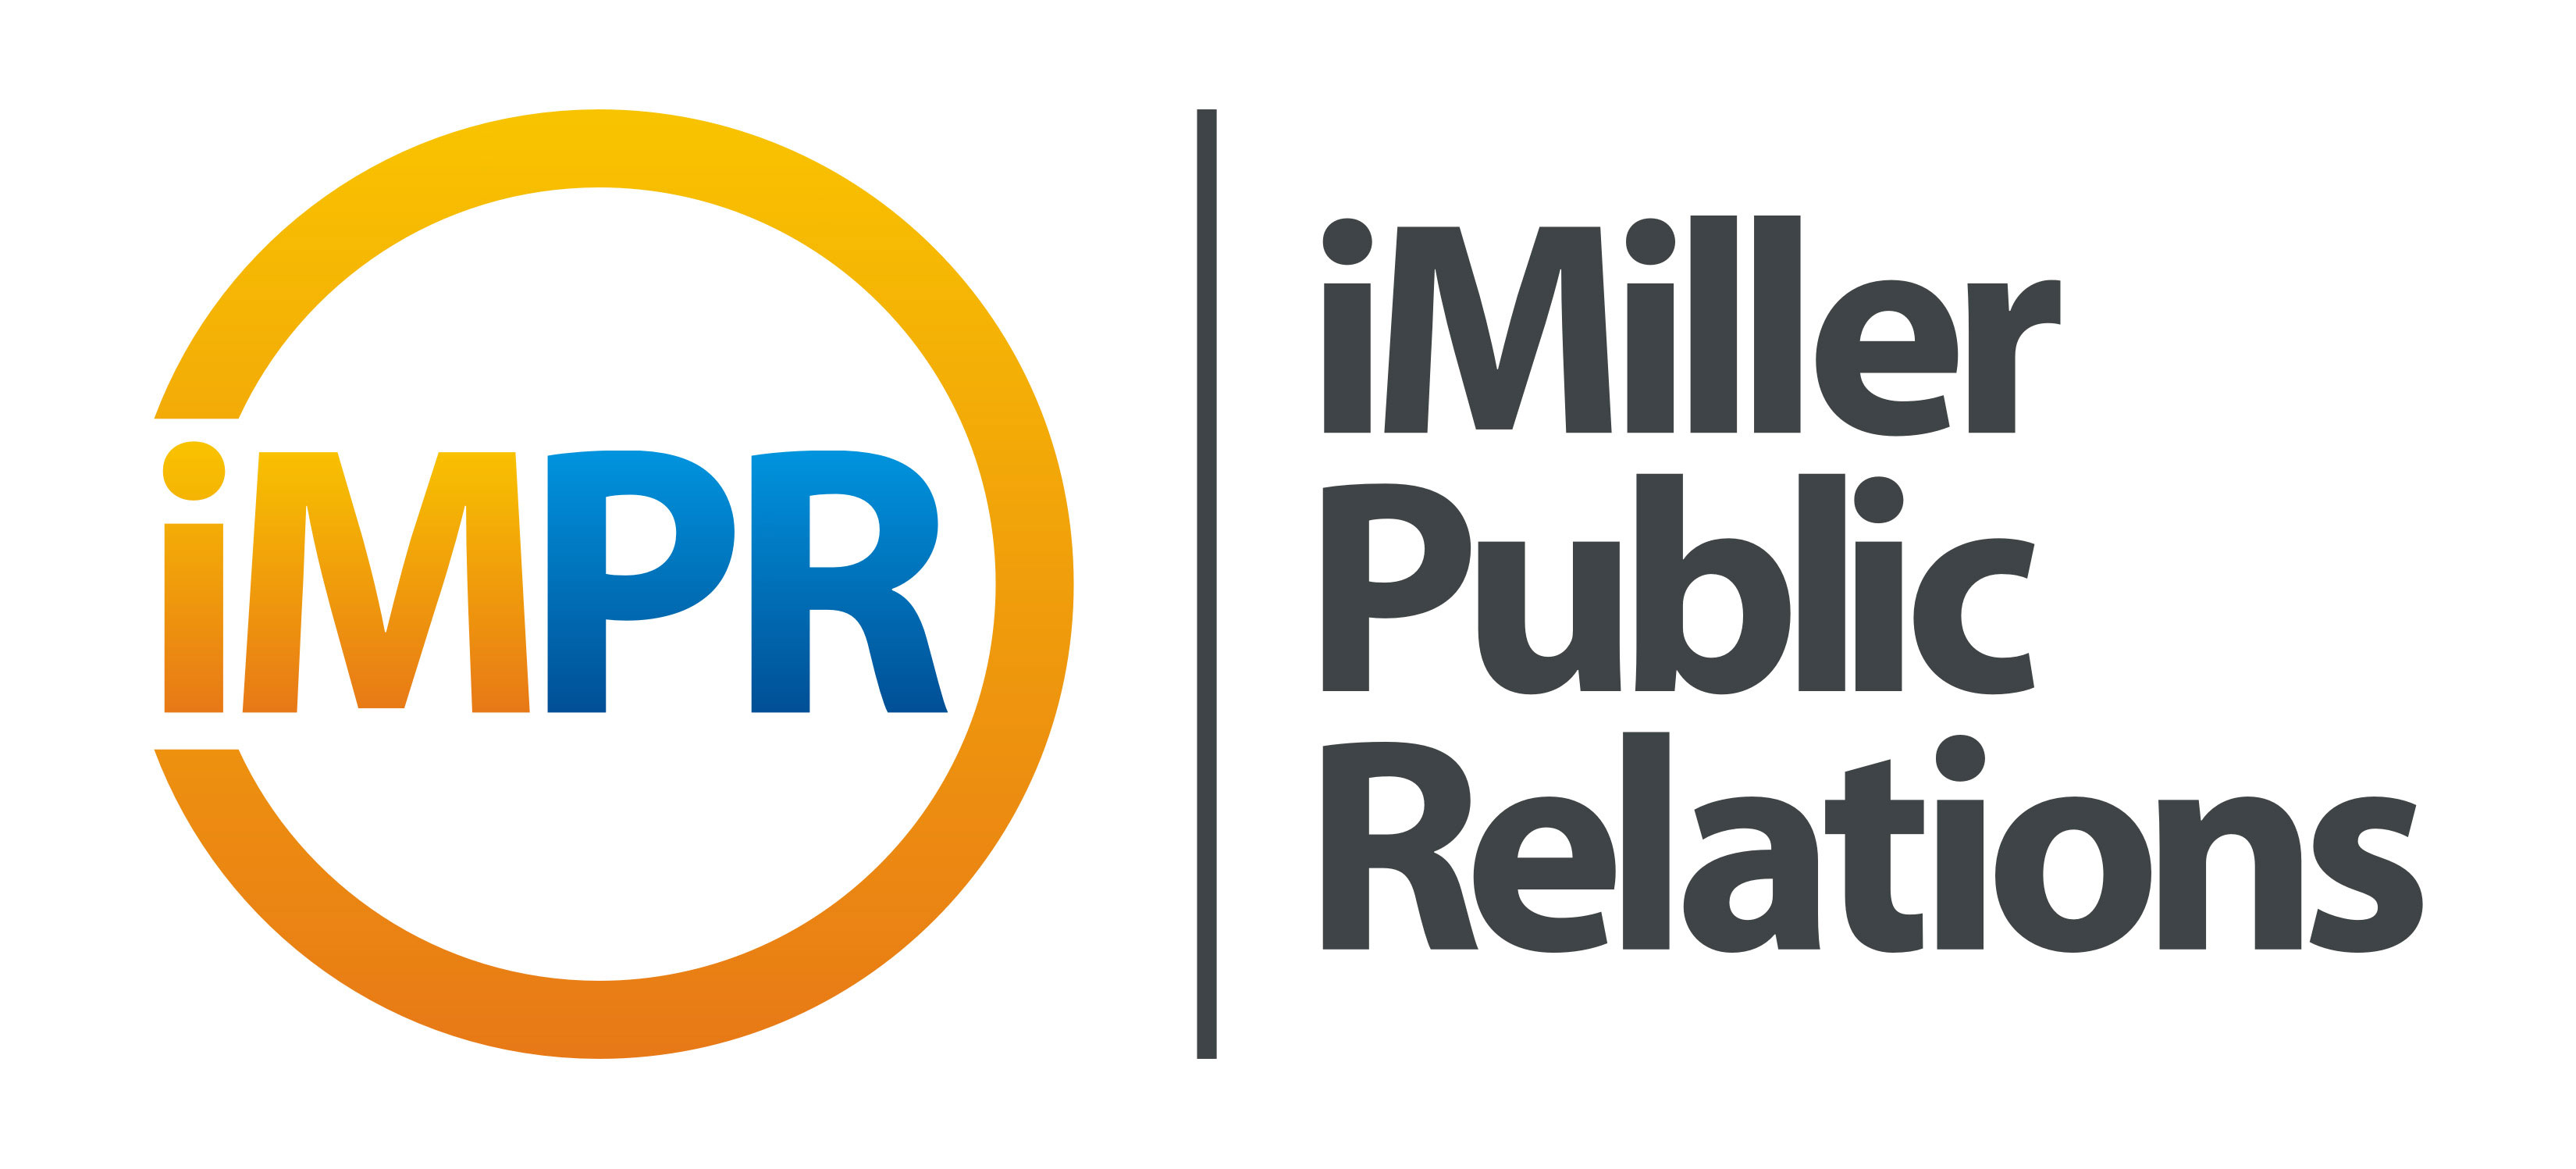 IMPR_logo-3